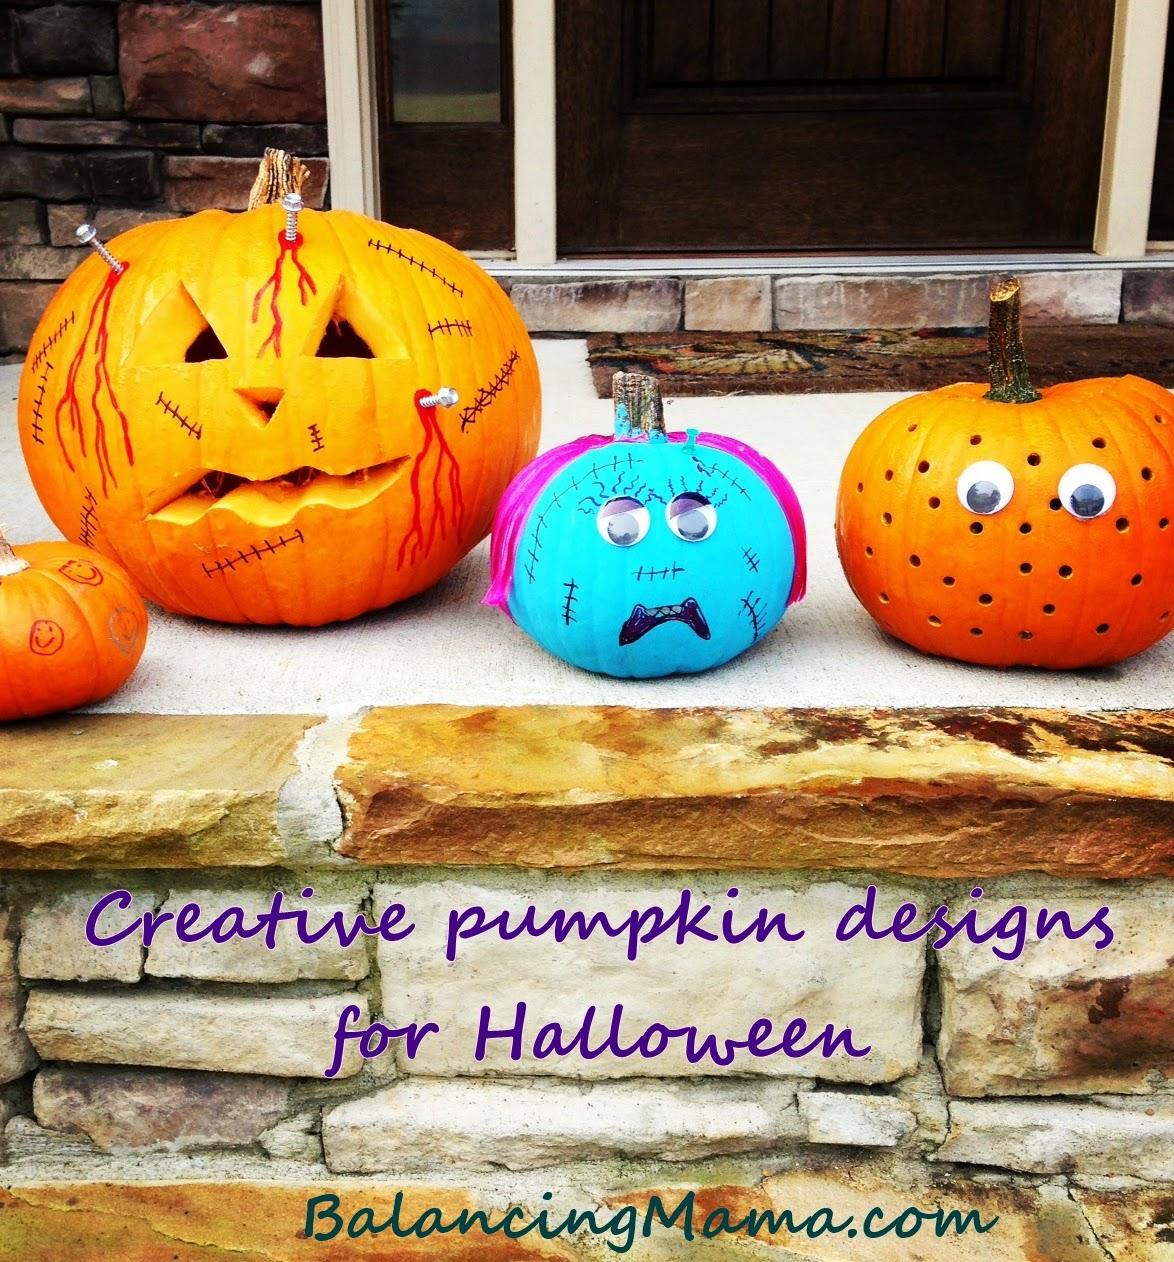 Creative Halloween Decoration Ideas: From @BalancingMama: Creative Pumpkin Designs For Halloween